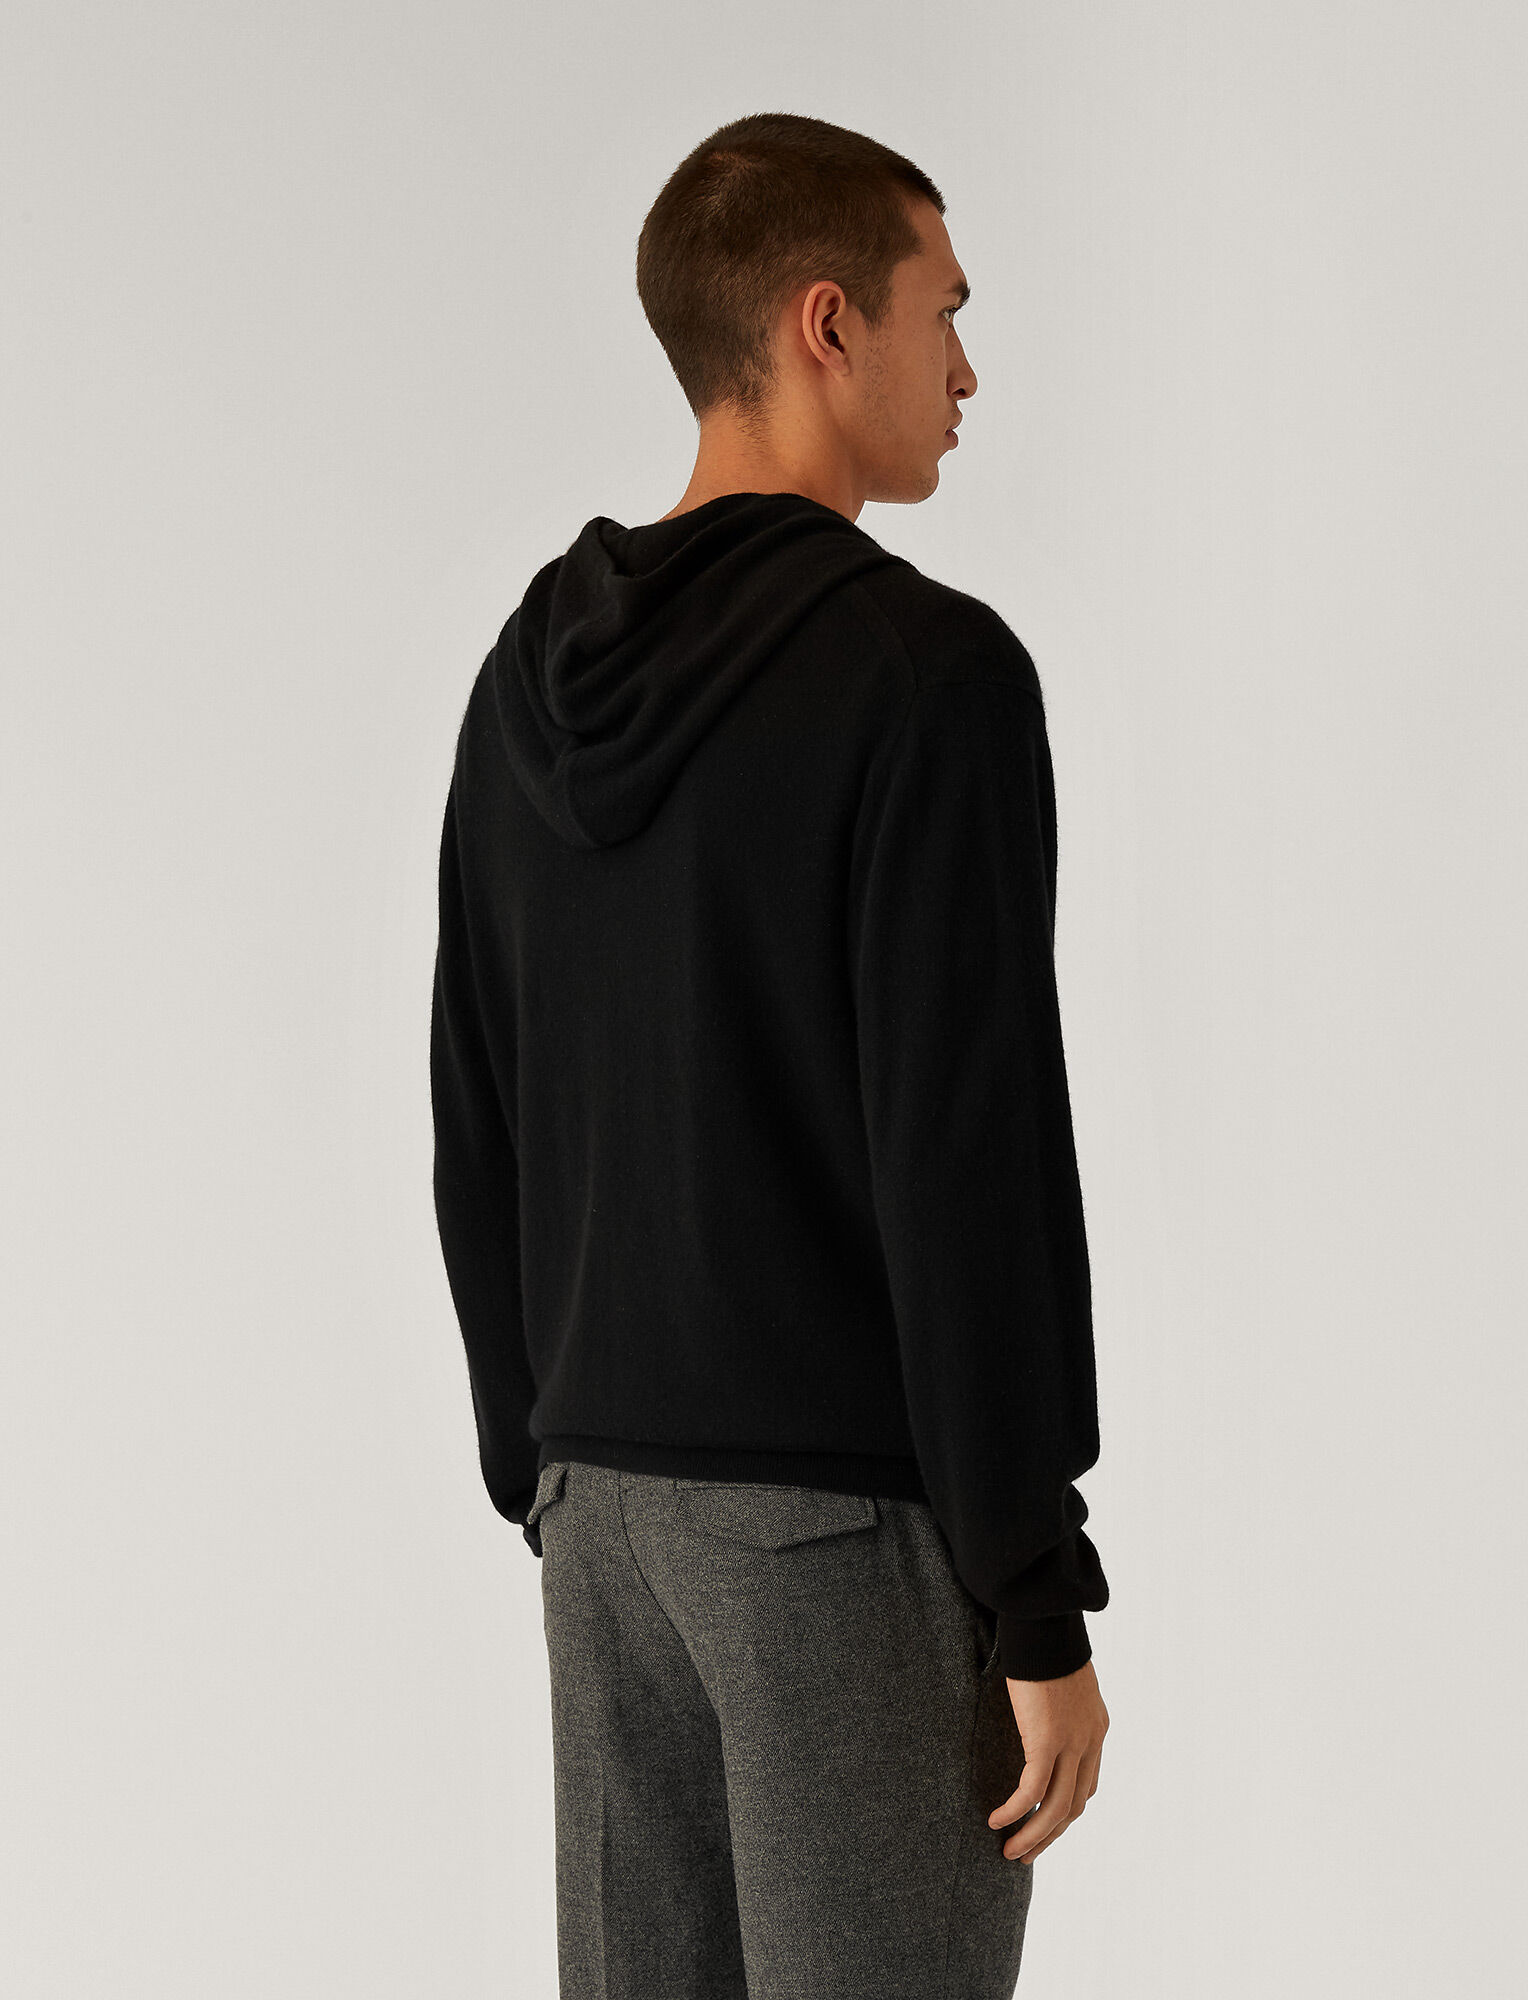 Joseph, Hoodie Cashmere Knit, in Black